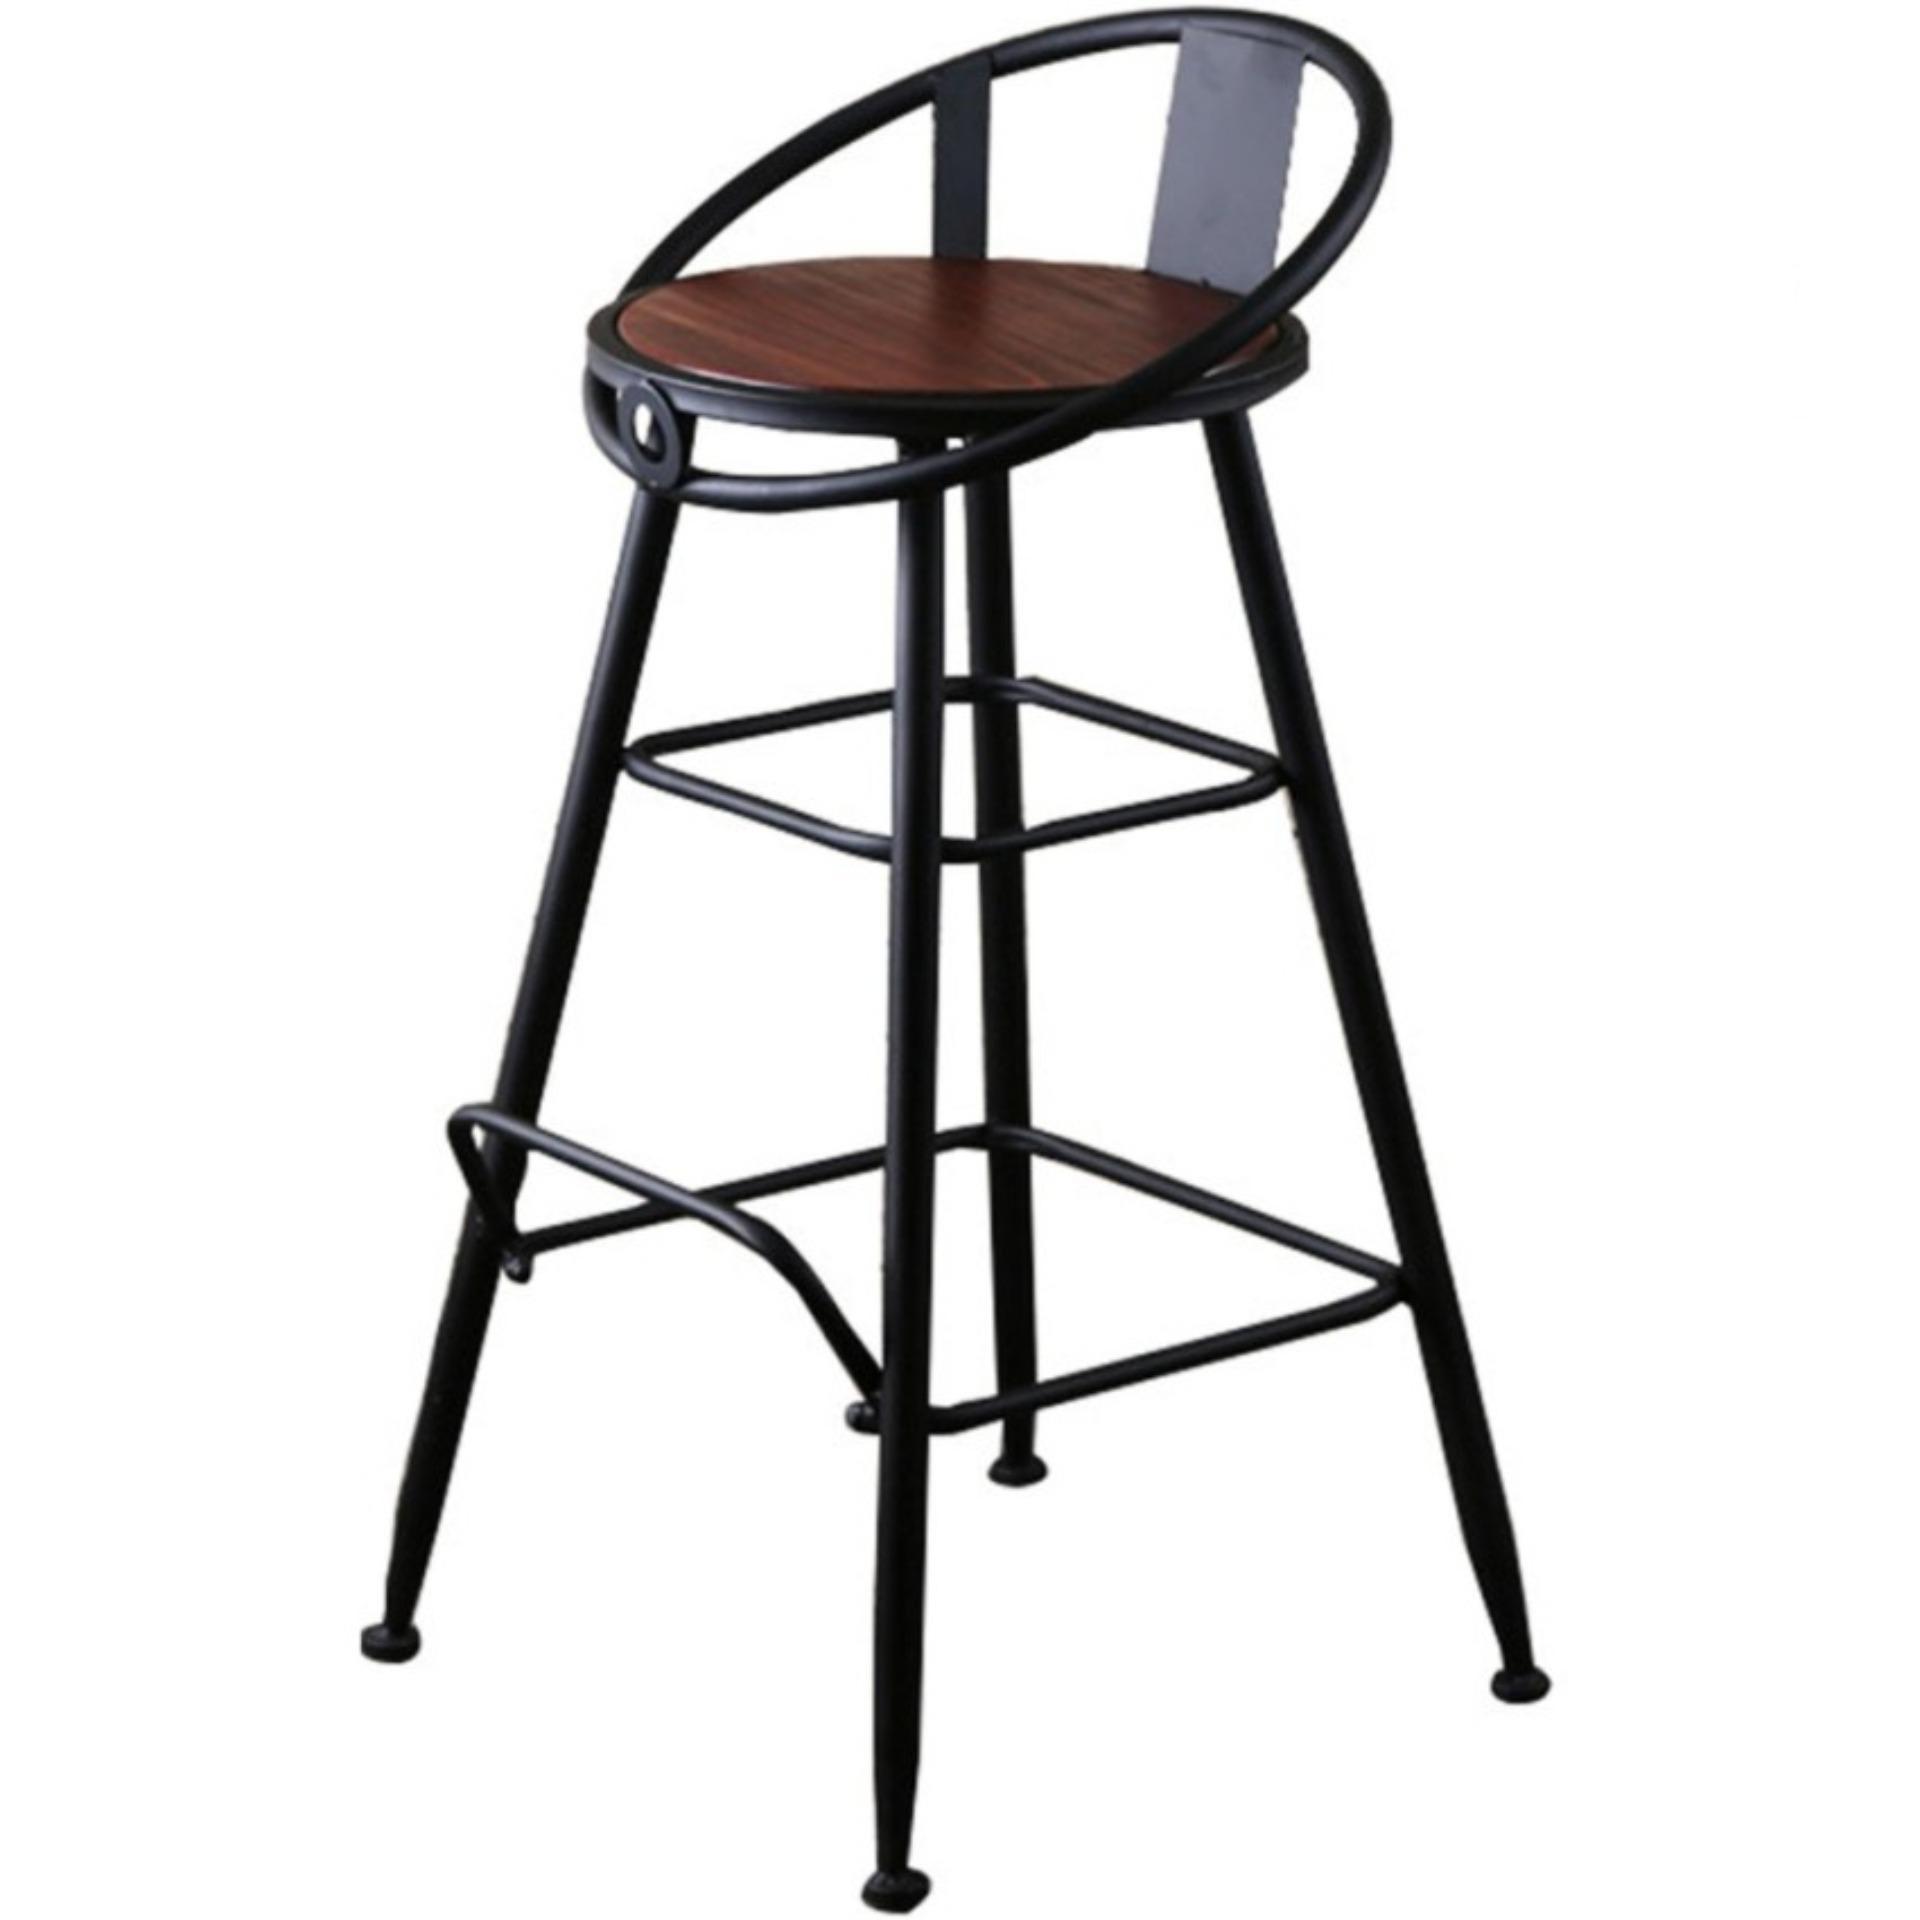 Retro High Chair Stools Bar Stool 75cm Wood